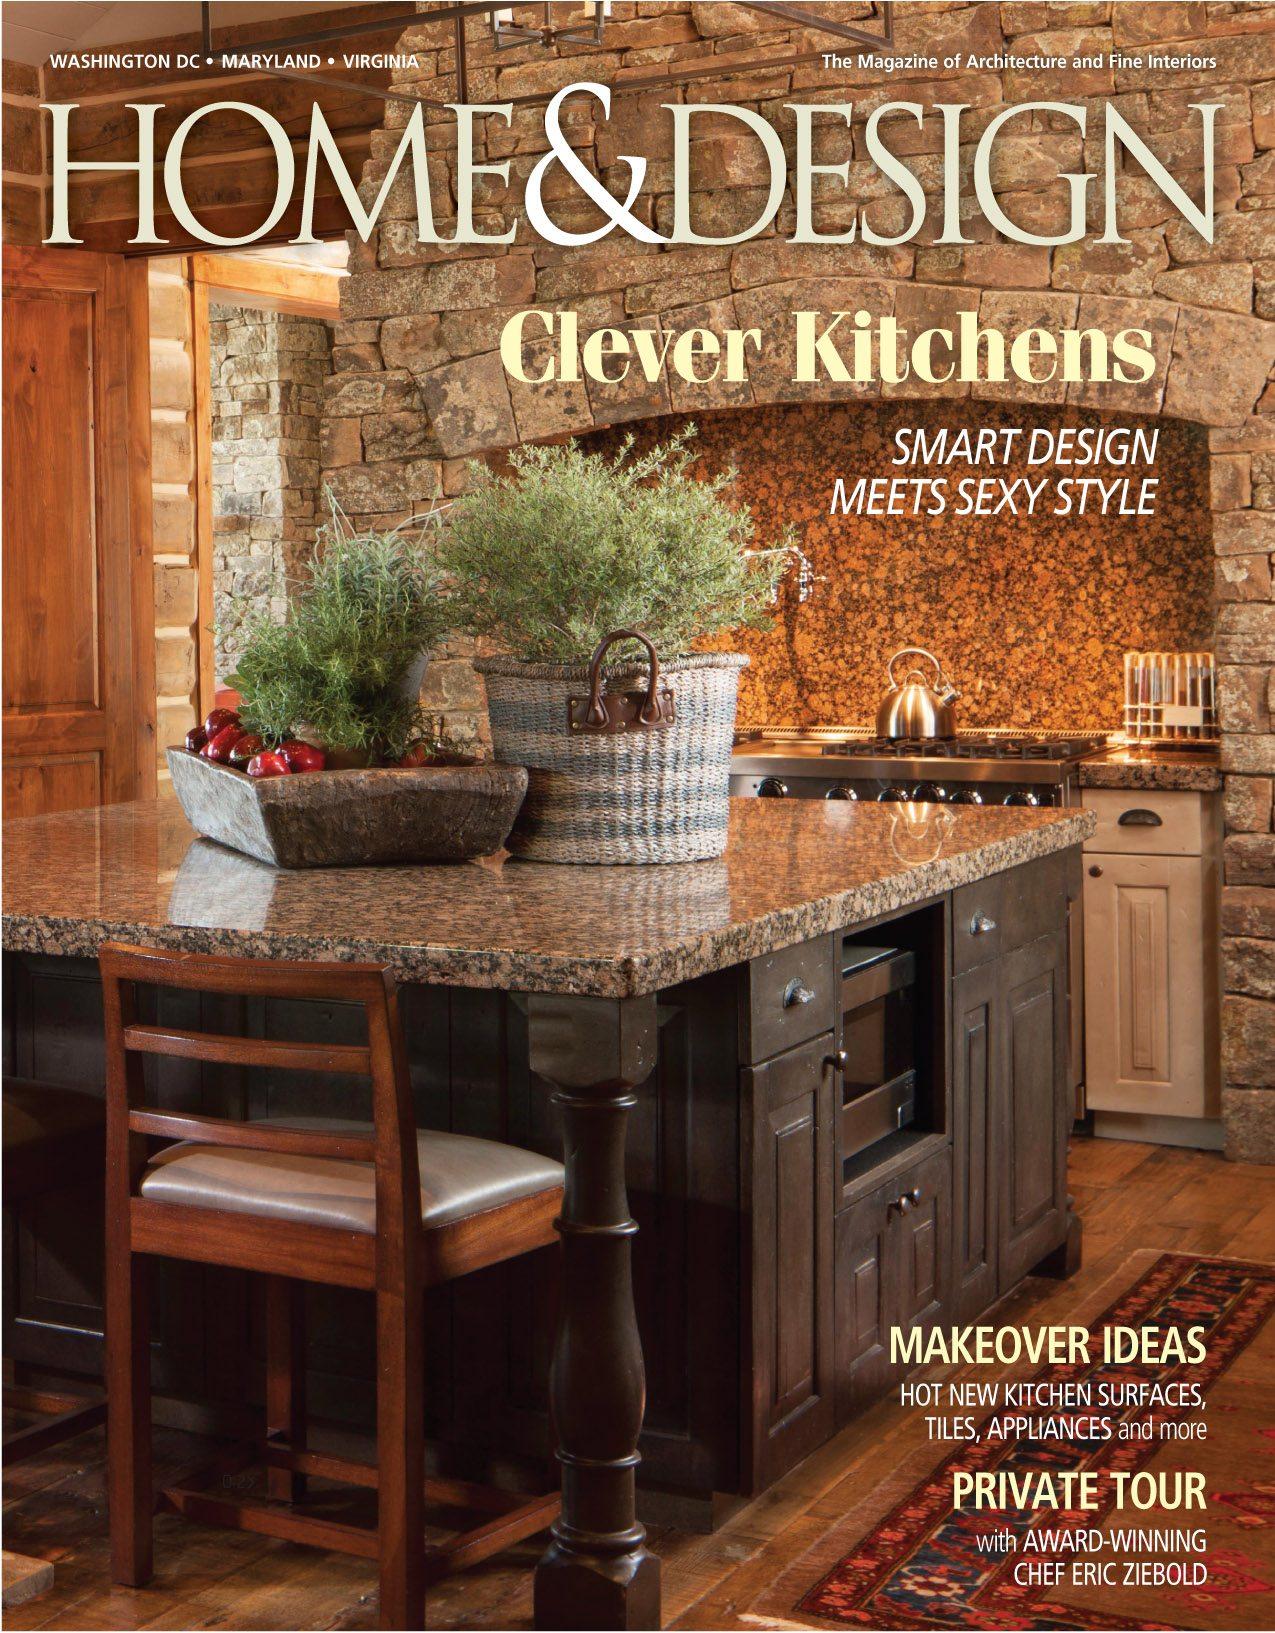 January February 2016 Archives Home & Design Magazine